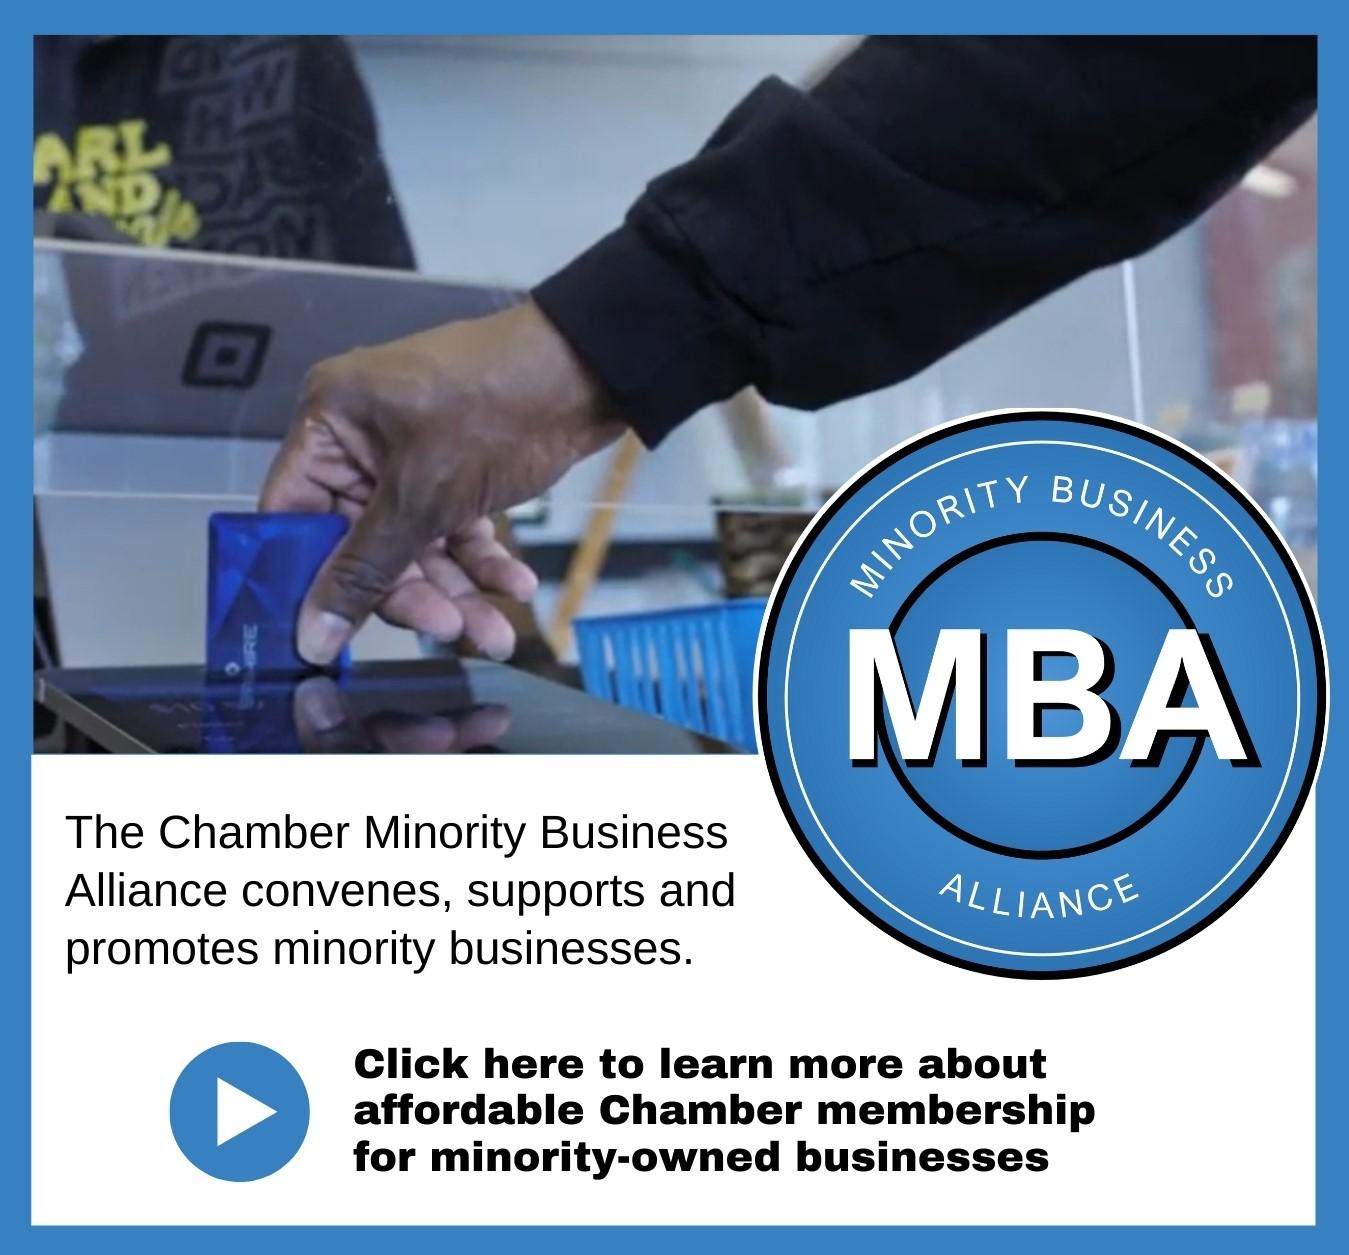 MBA membership